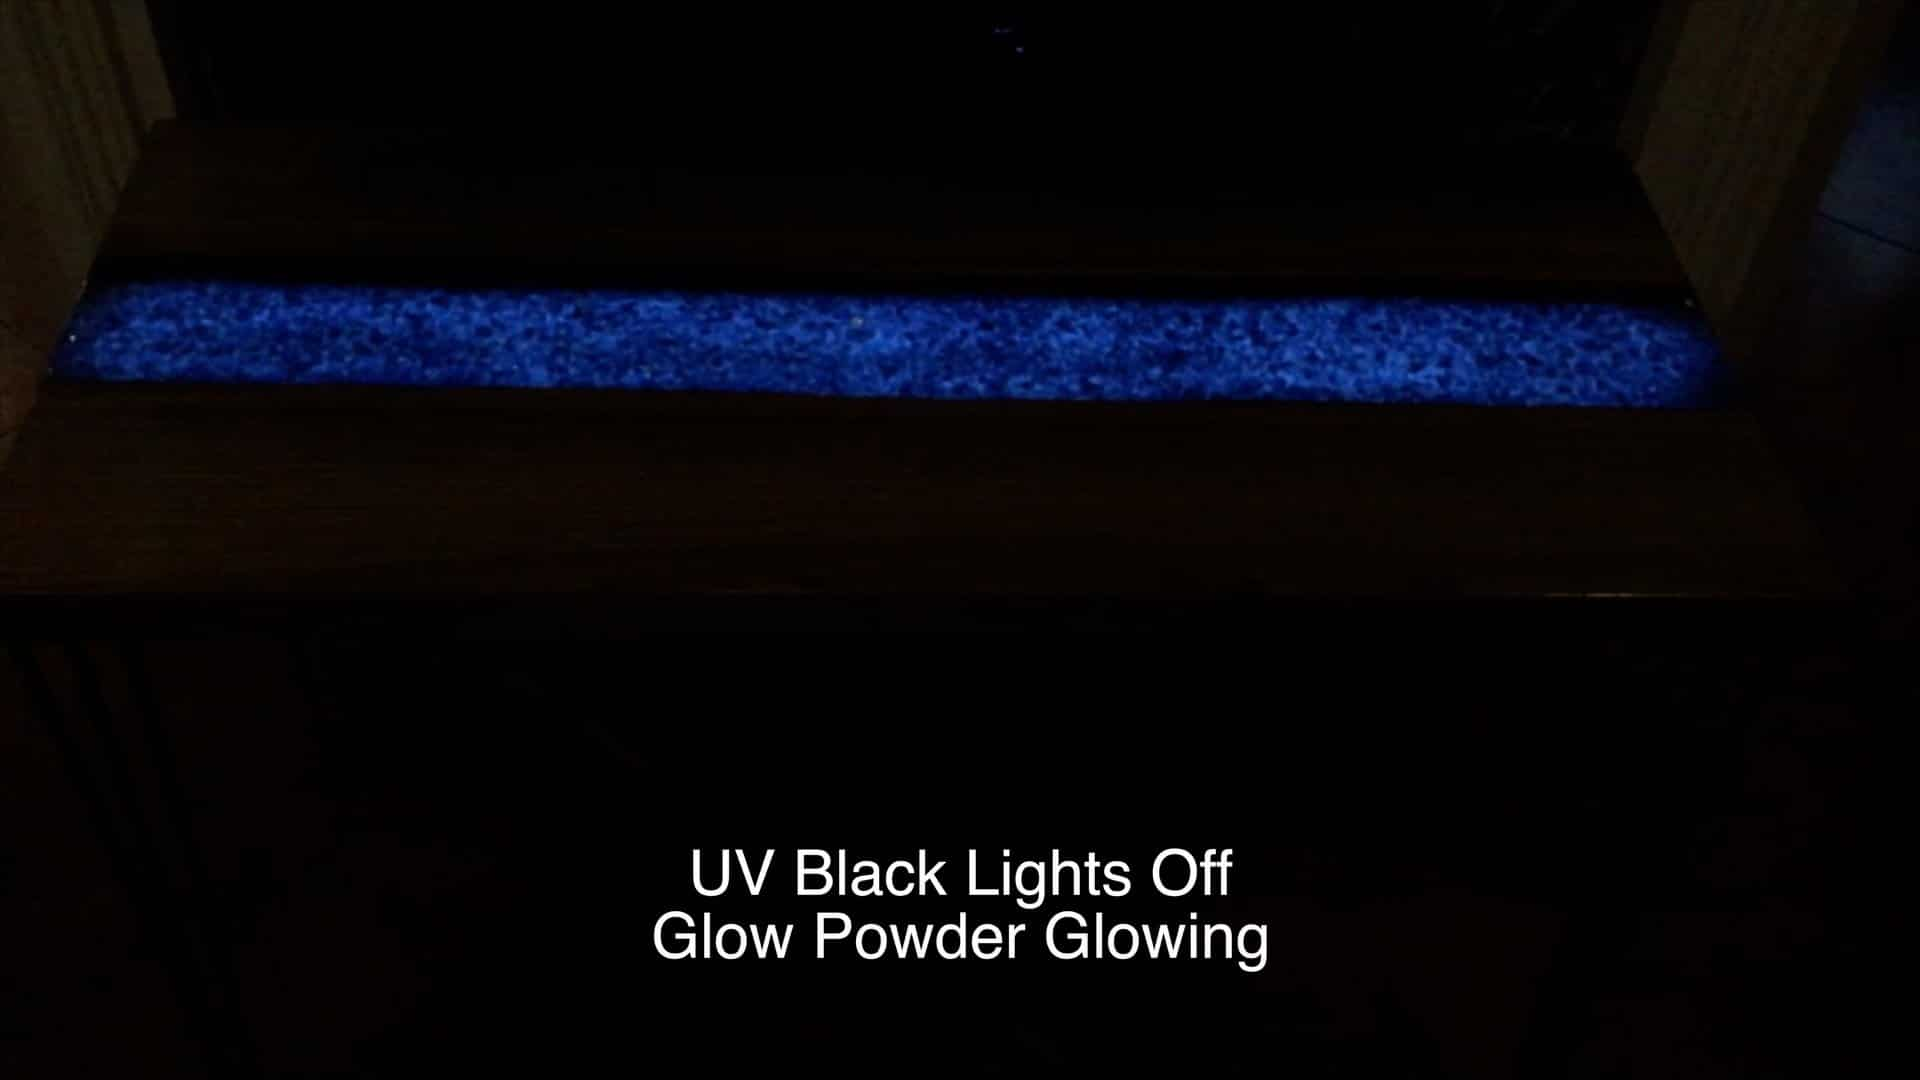 epoxy-resin-river-table-glowpowder_20171016_94